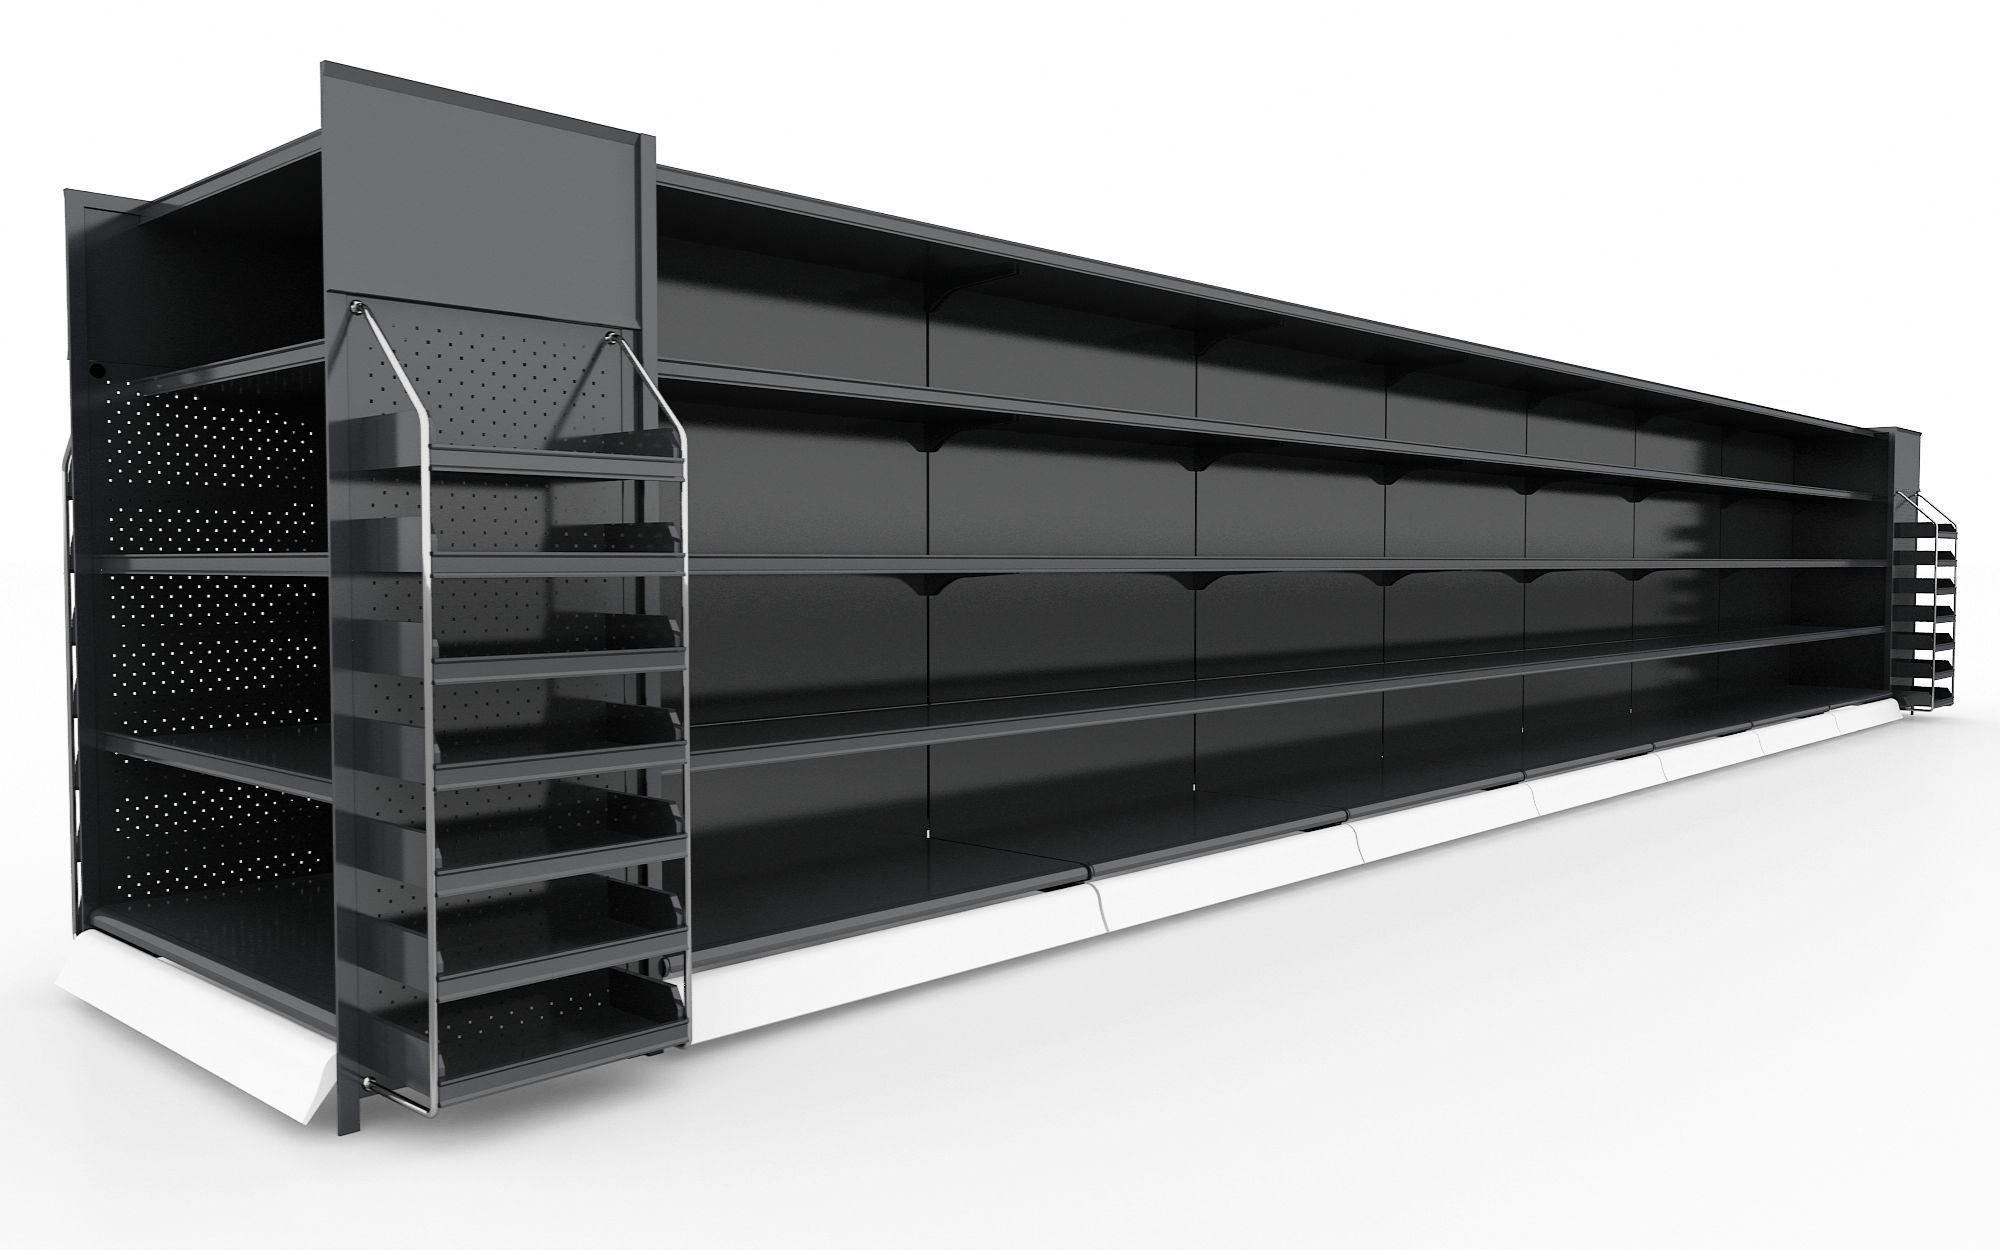 Shelf 3D model 17